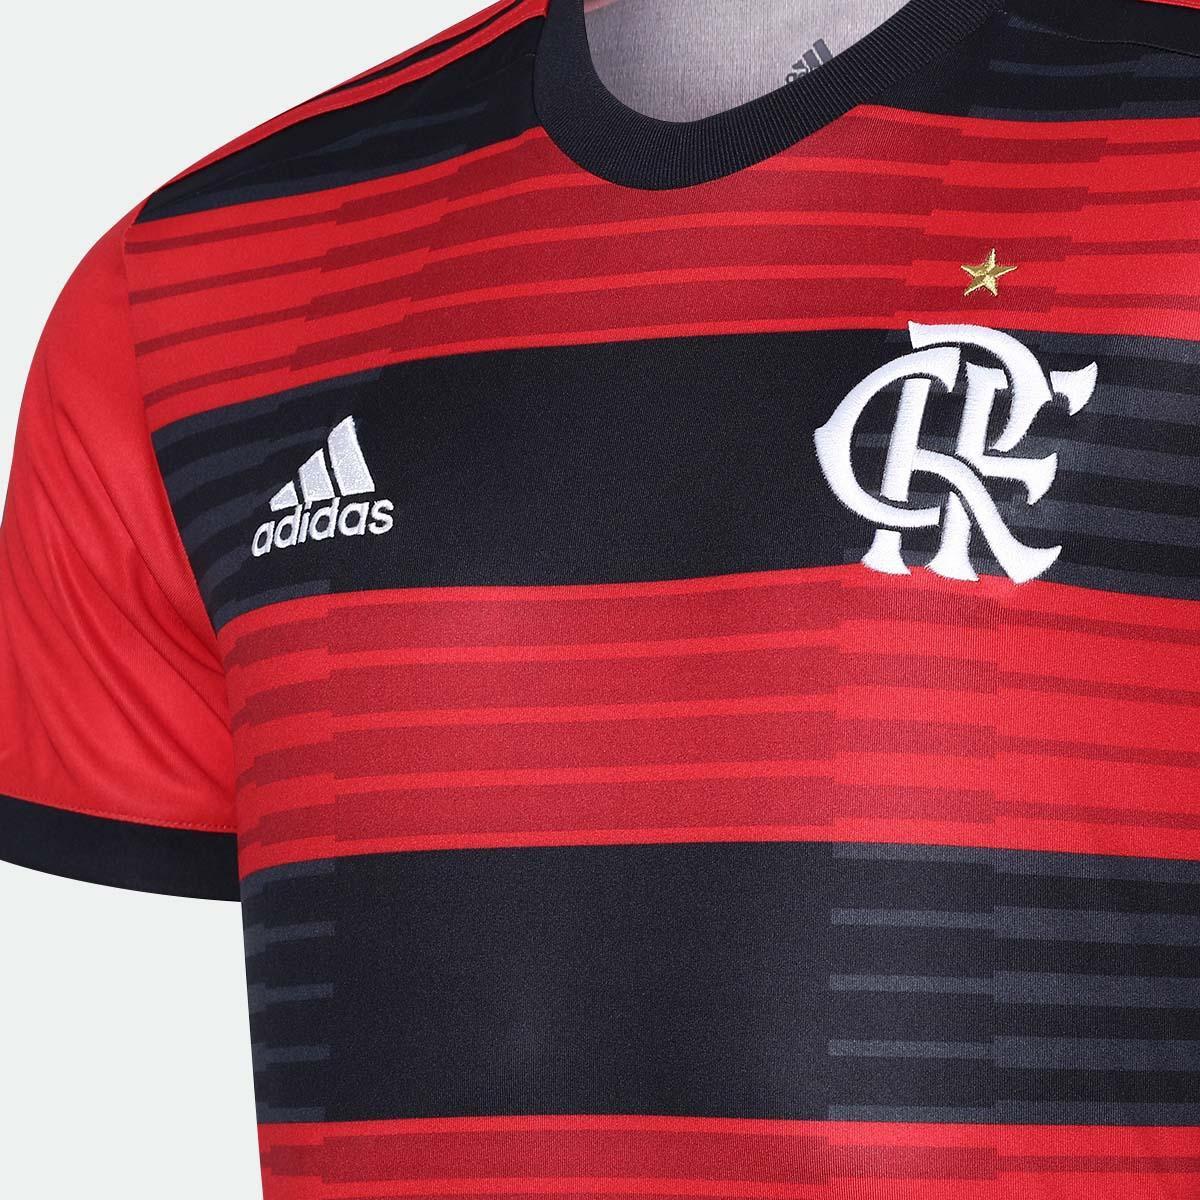 Camisa Flamengo I 2018 s n° Torcedor Adidas Masculina - Vermelho e ... f227c337afb87